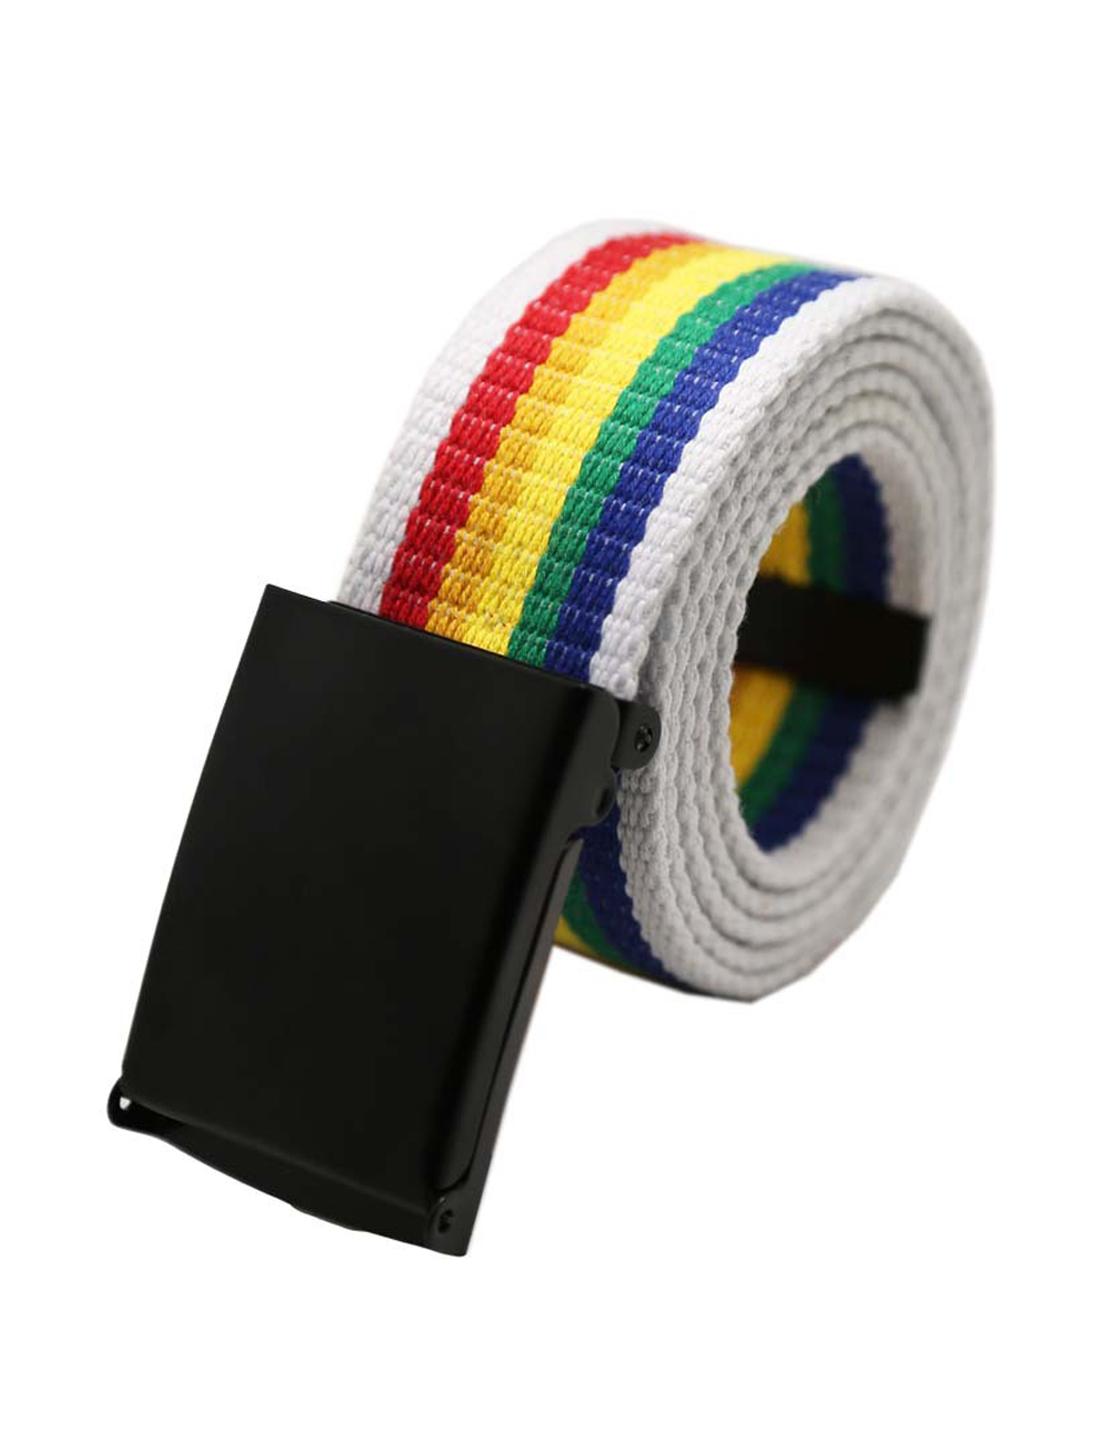 "Unisex Canvas No Hole Slide Buckle Waist Belt Width 1 5/8"" Multicolor"